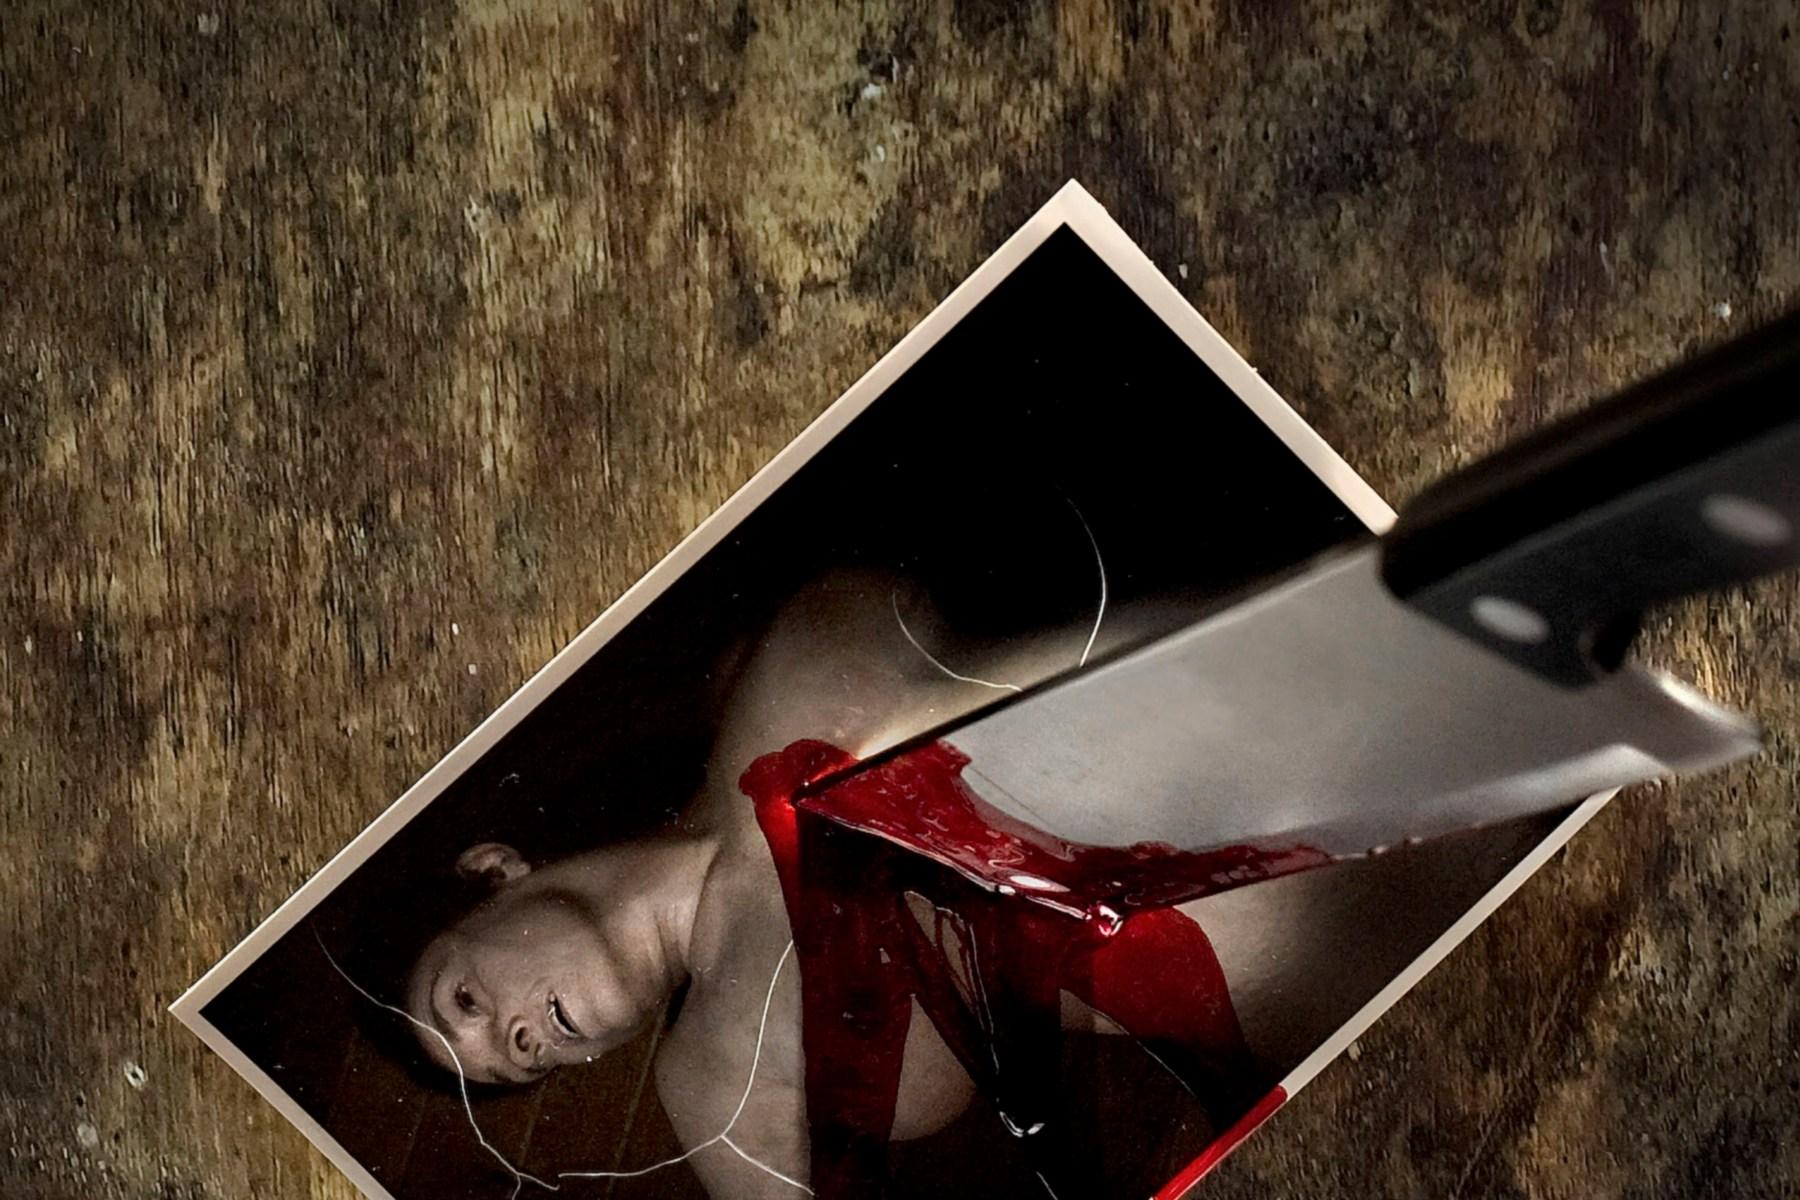 Amateur Spy Cam Porn death of a porn king - rolling stone